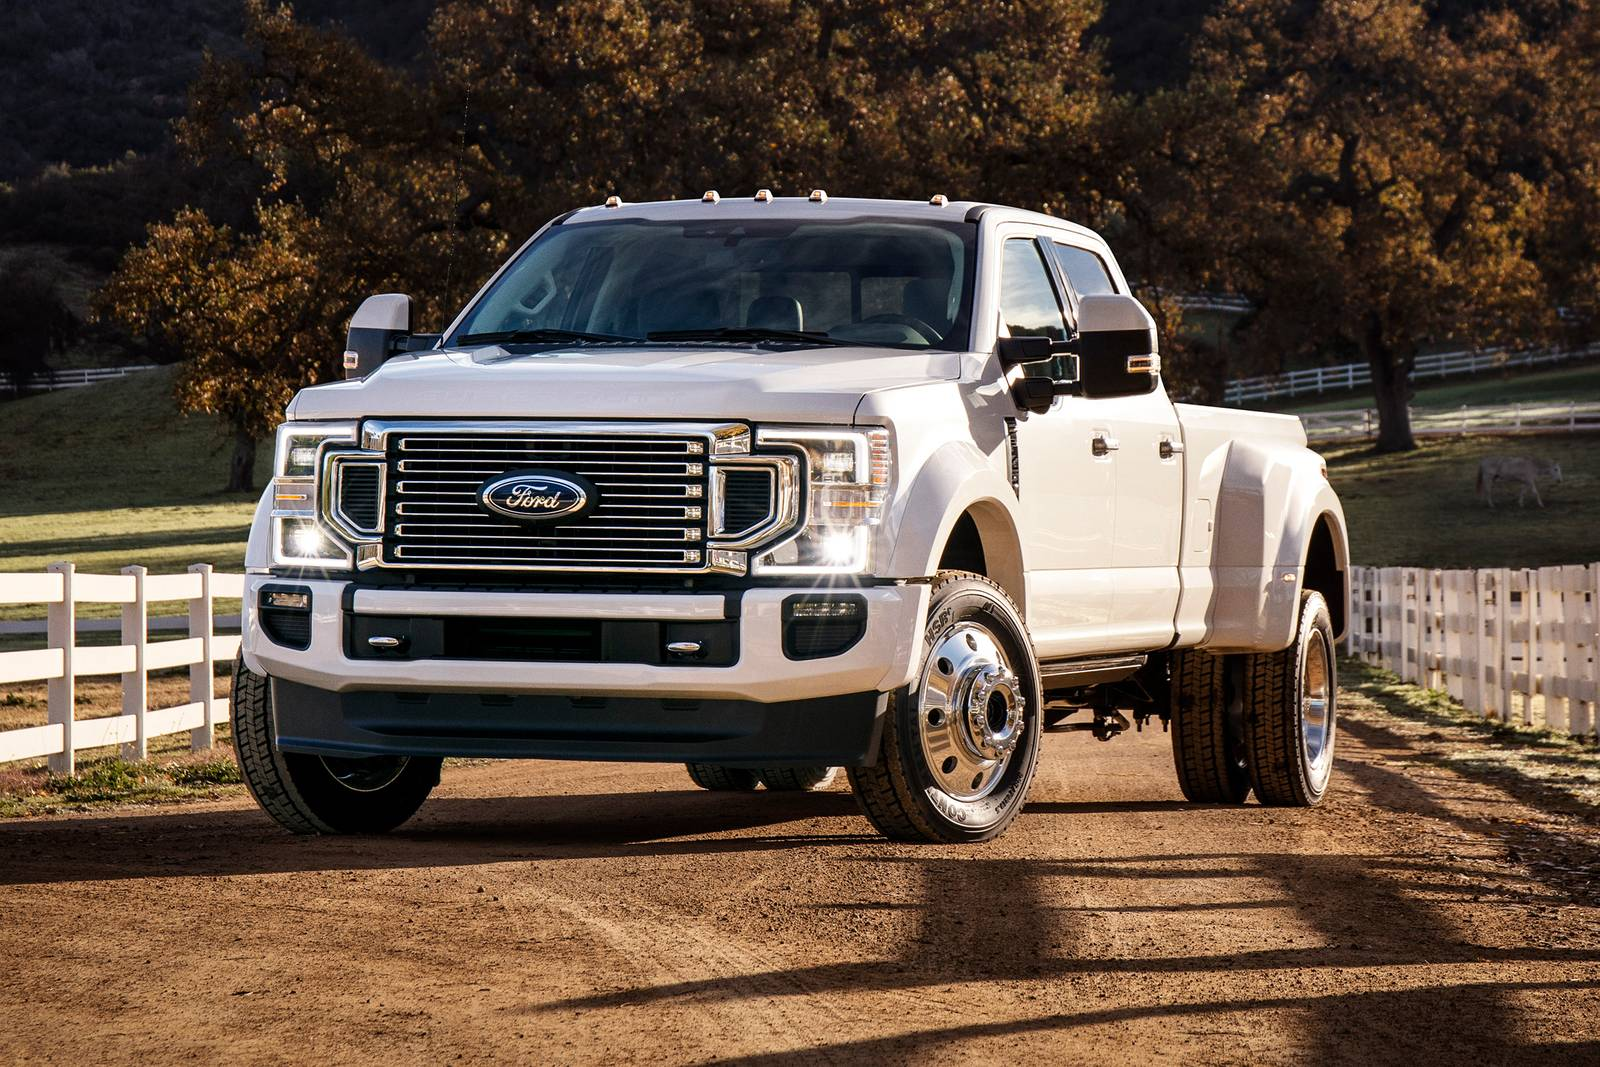 White 2021 Ford F-450 dually Super Duty crew cab truck